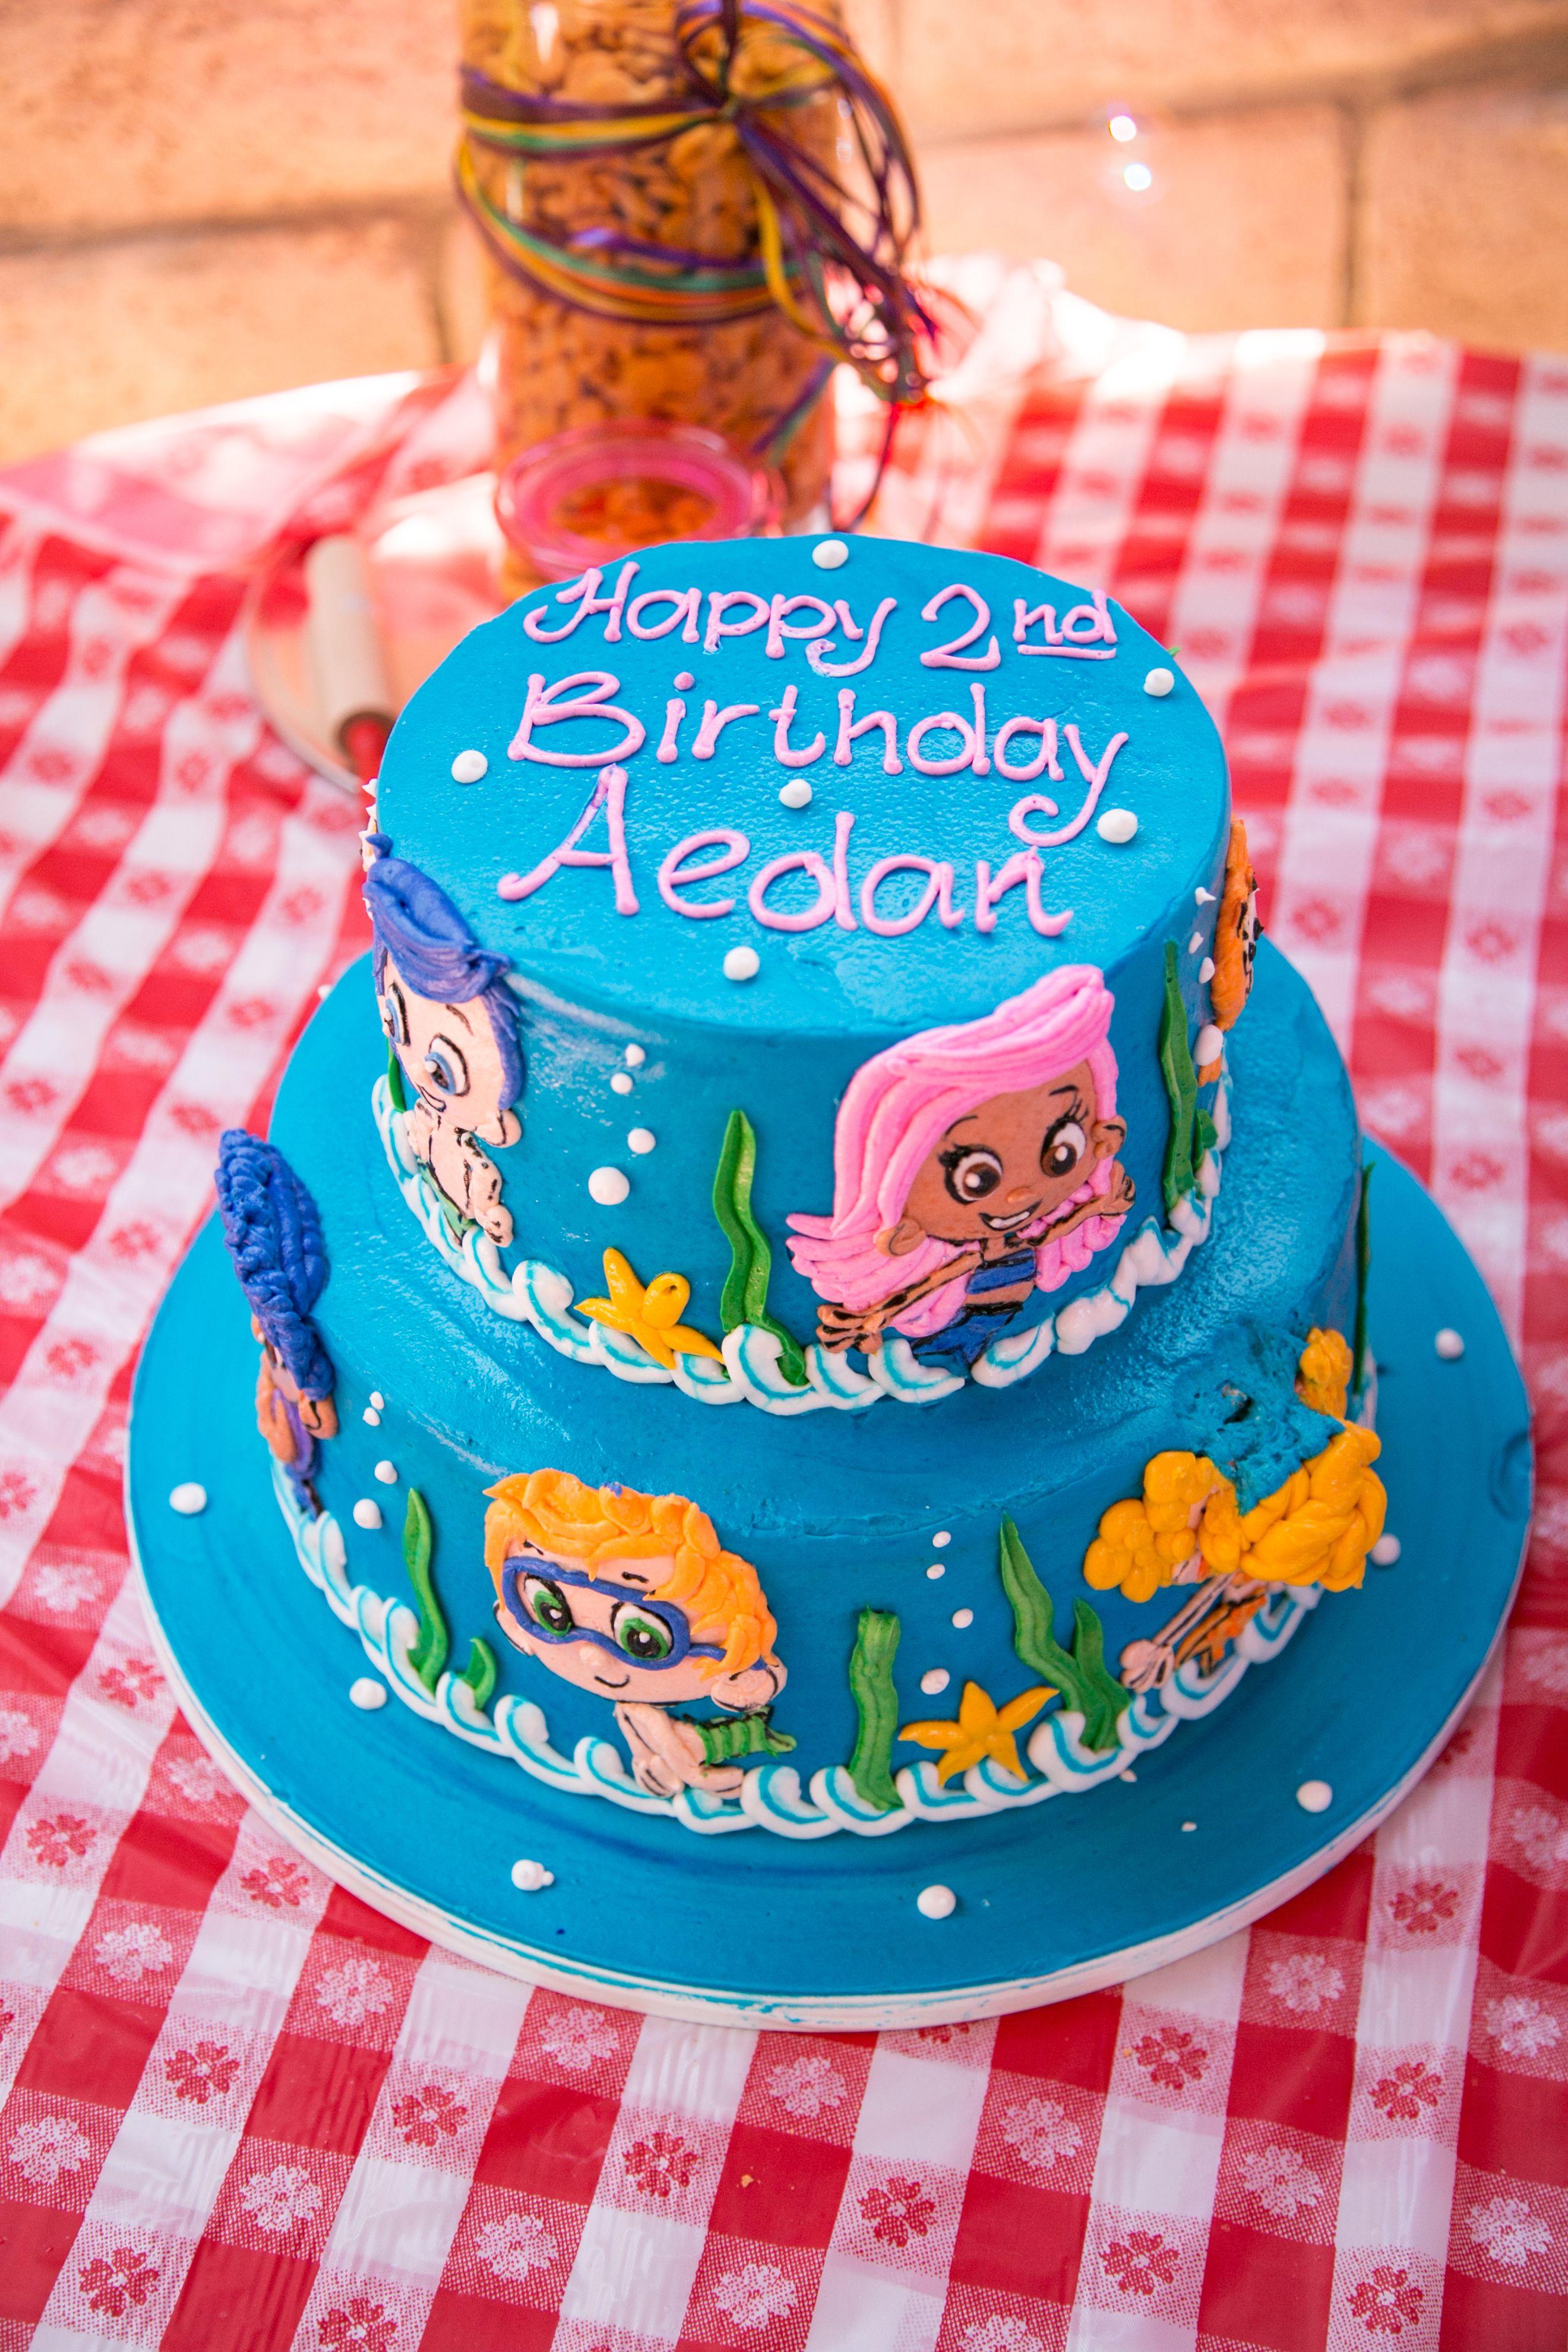 ... birthday party ideas 2nd birthday birthday cakes baby boys cake